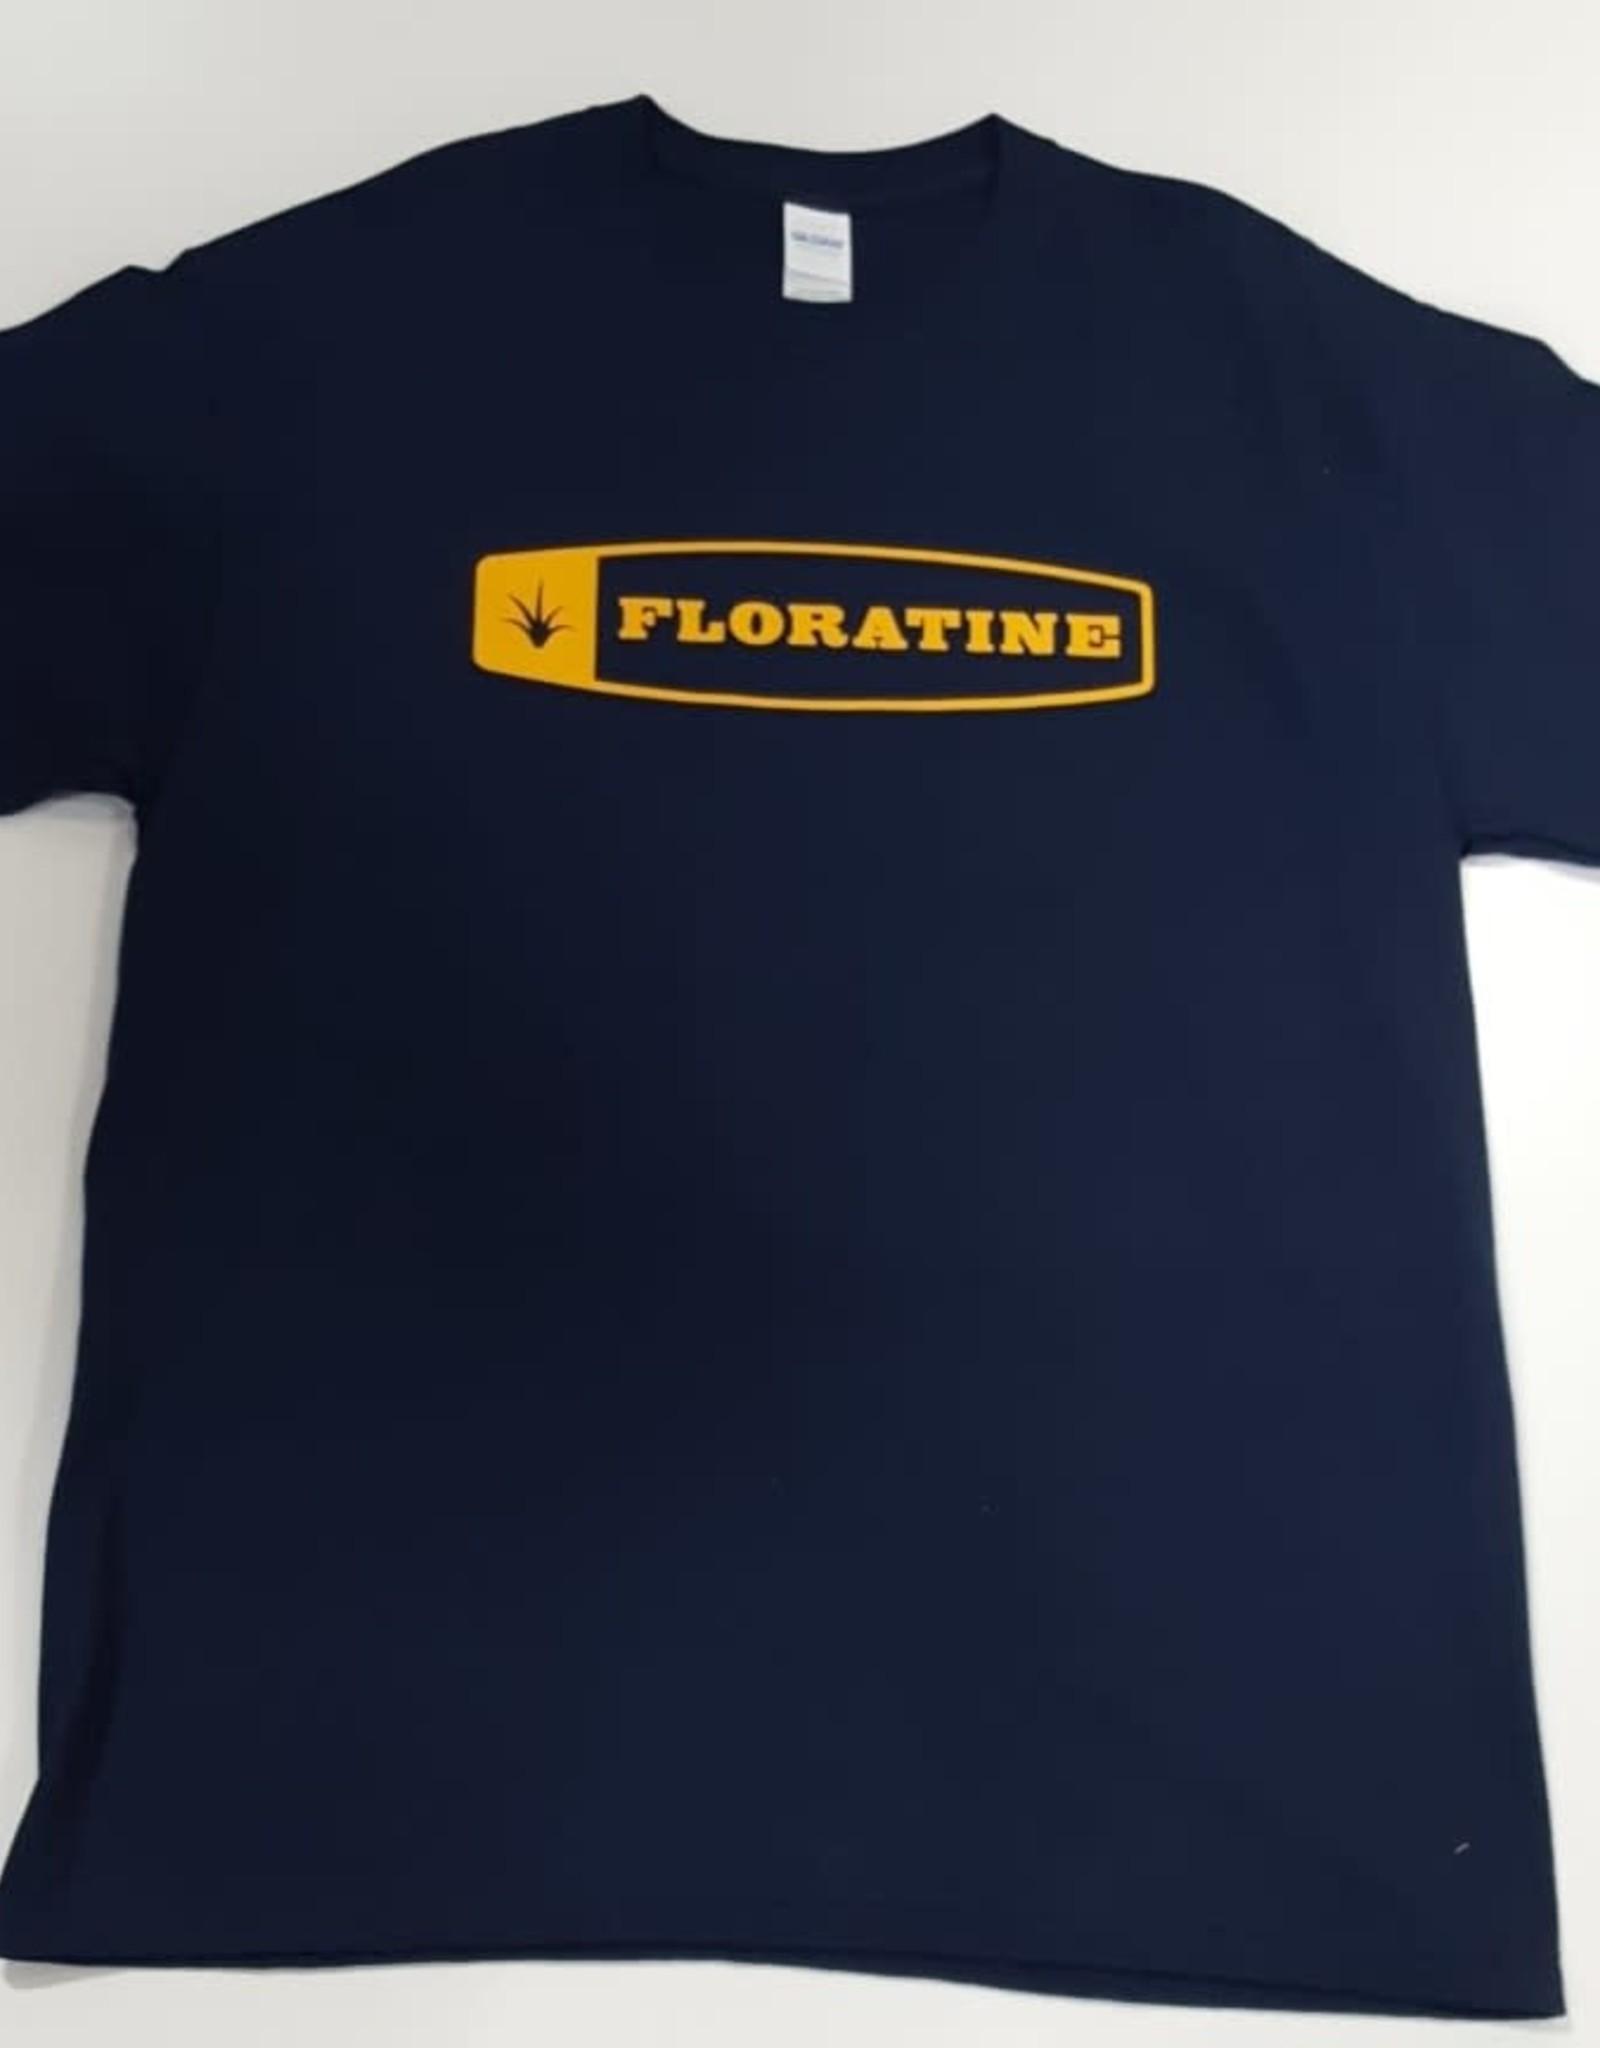 Gildan Floratine  S/S Tee with Logo